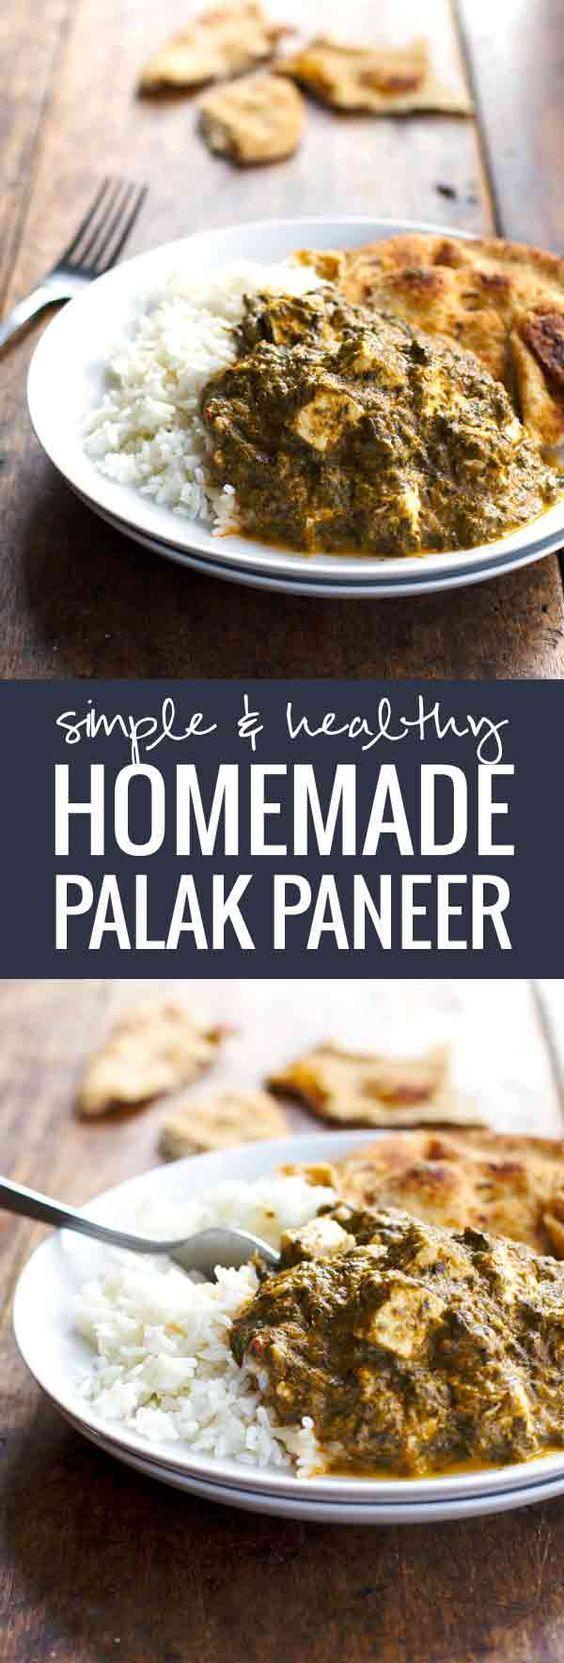 Homemade Healthy Palak Paneer - Pinch of Yum